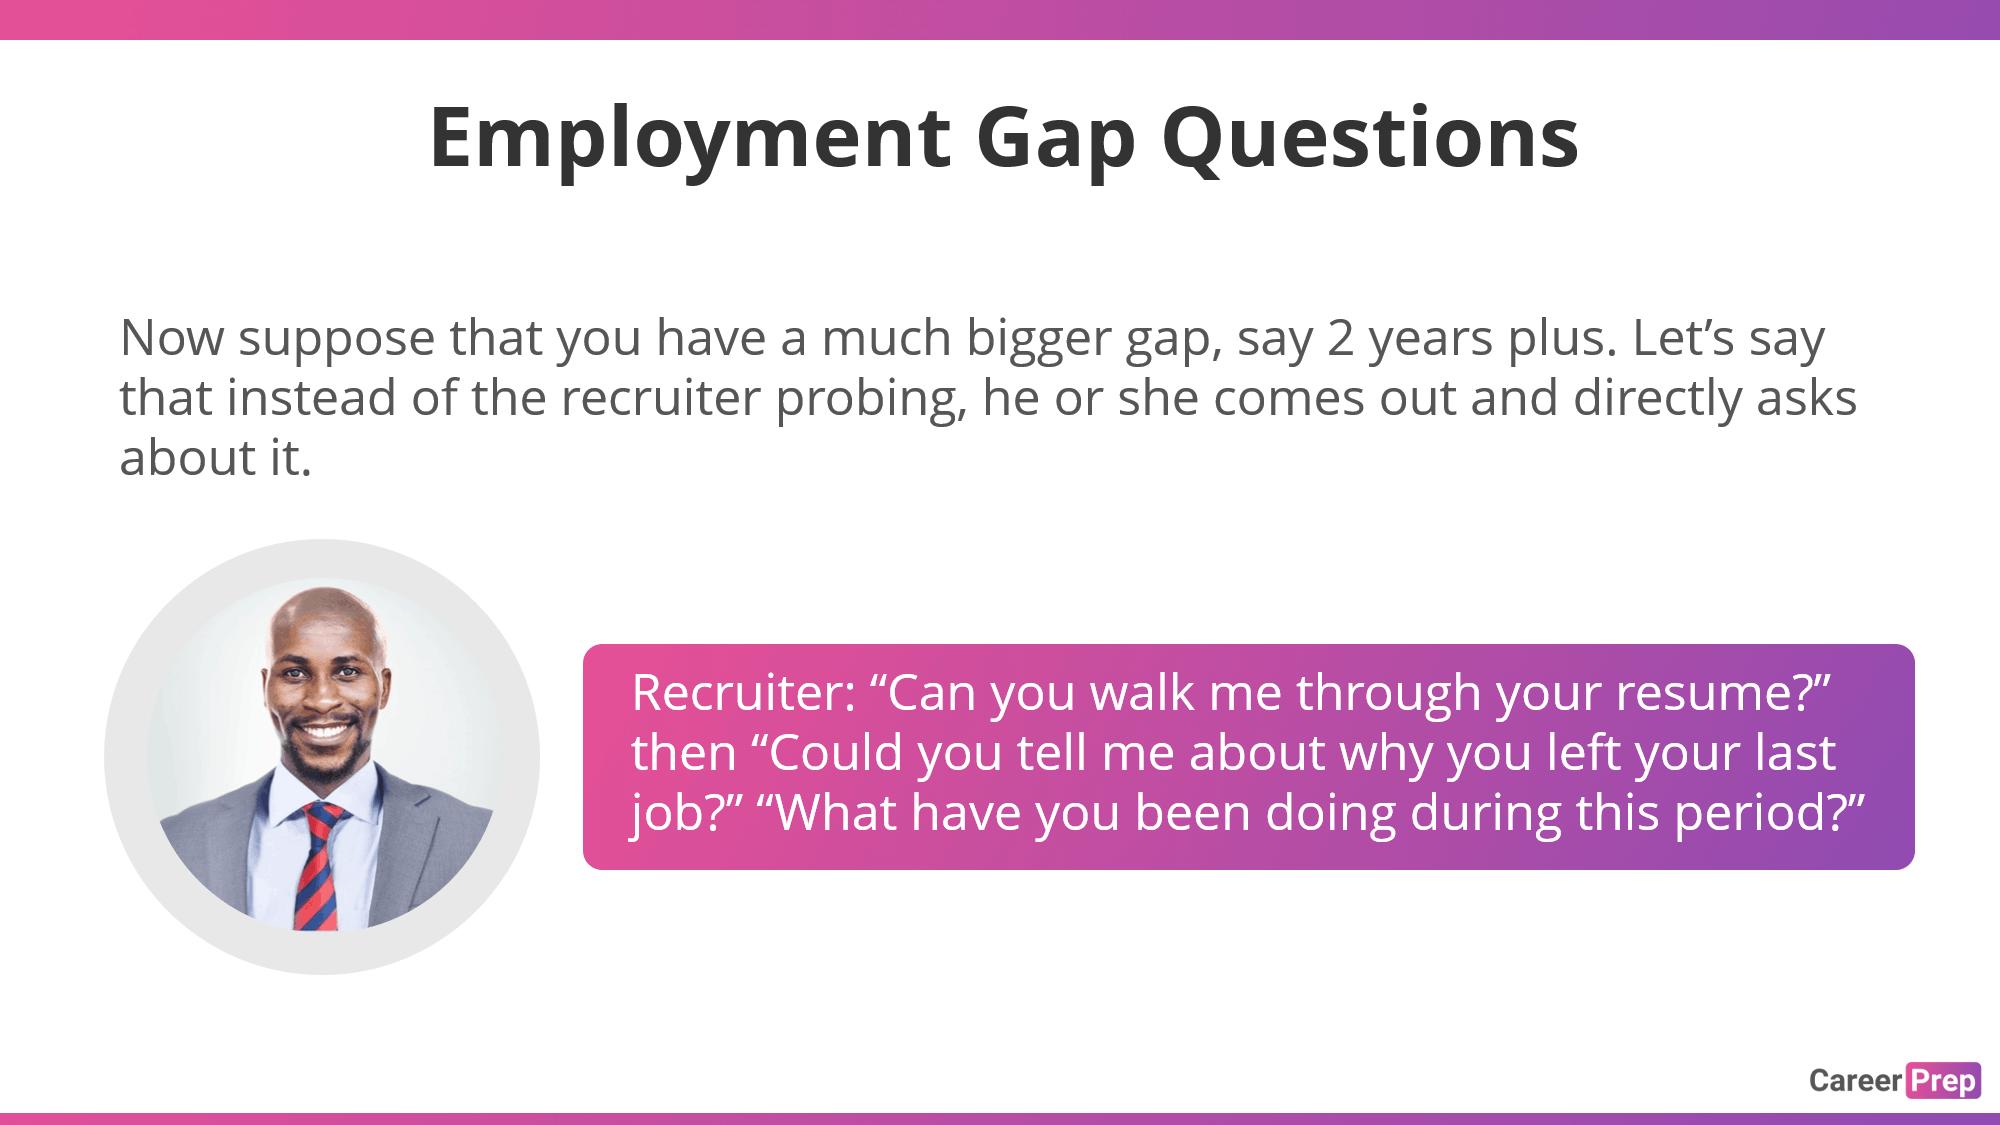 Employment Gap Questions